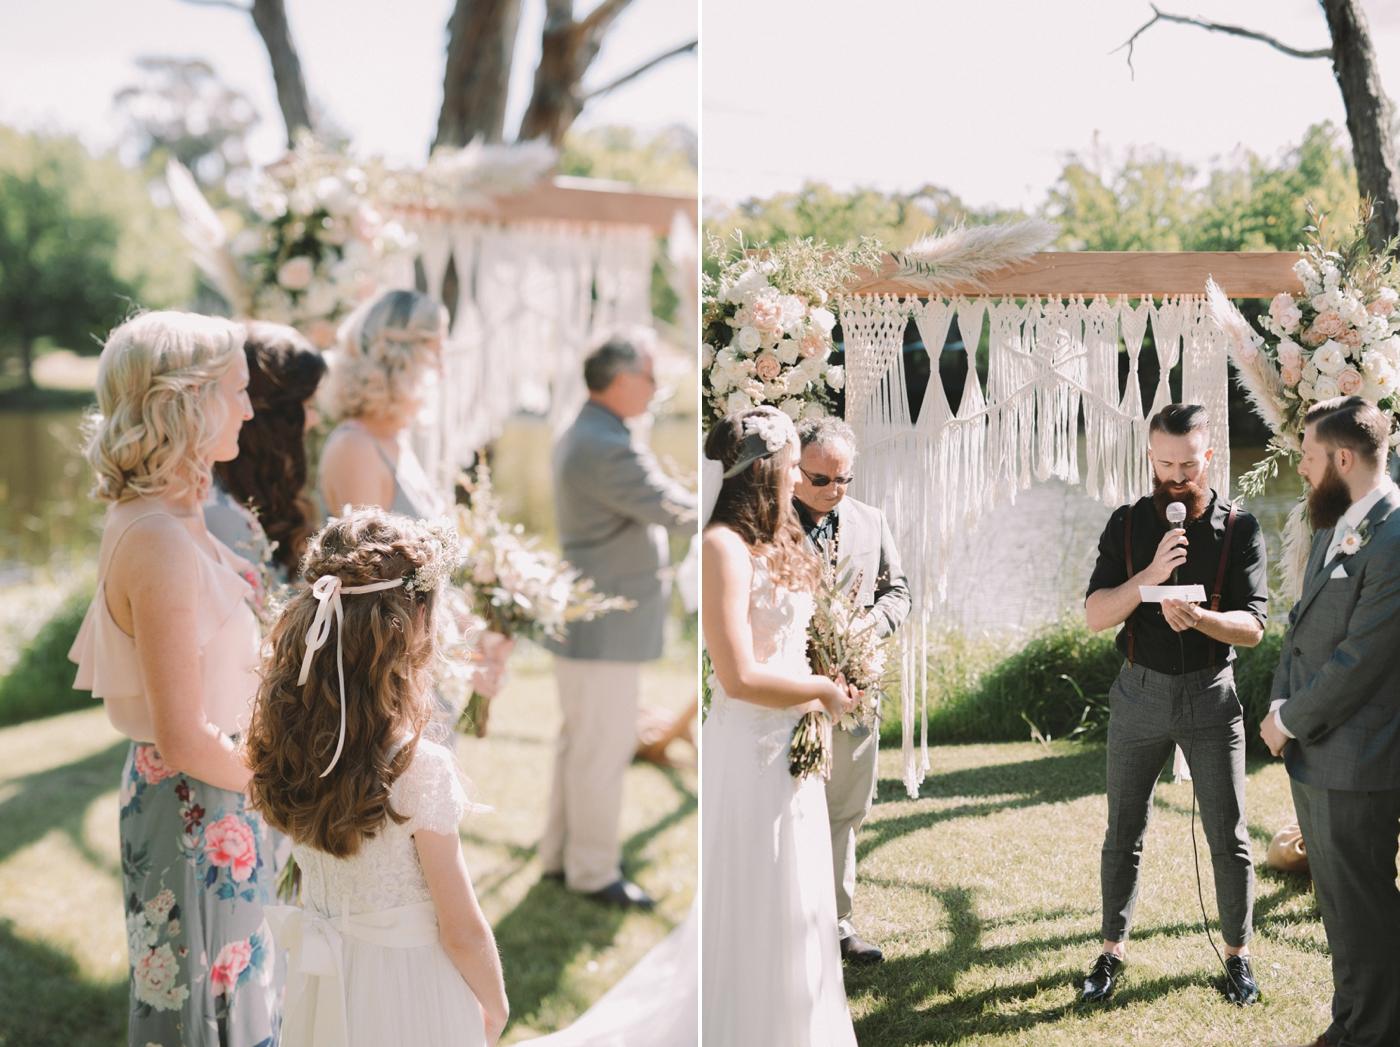 Maddy & Wes - K1 by Geoff Hardy Wedding - Adelaide Wedding Photographer - Natural wedding photography in Adelaide - Katherine Schultz_0026.jpg